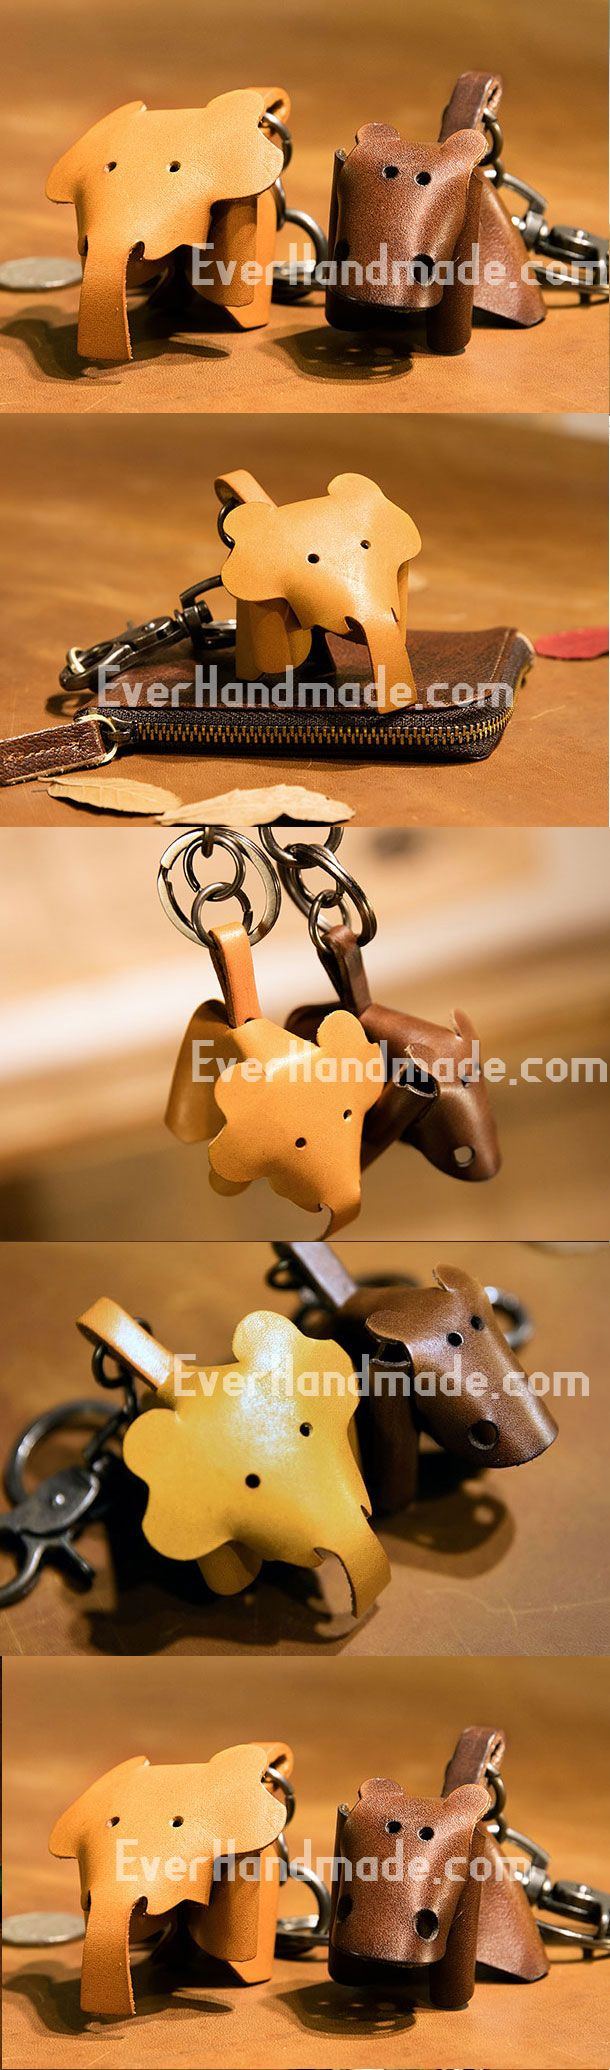 Handmade Elephant Hippo Key Wallet Keychain Leather Wallet